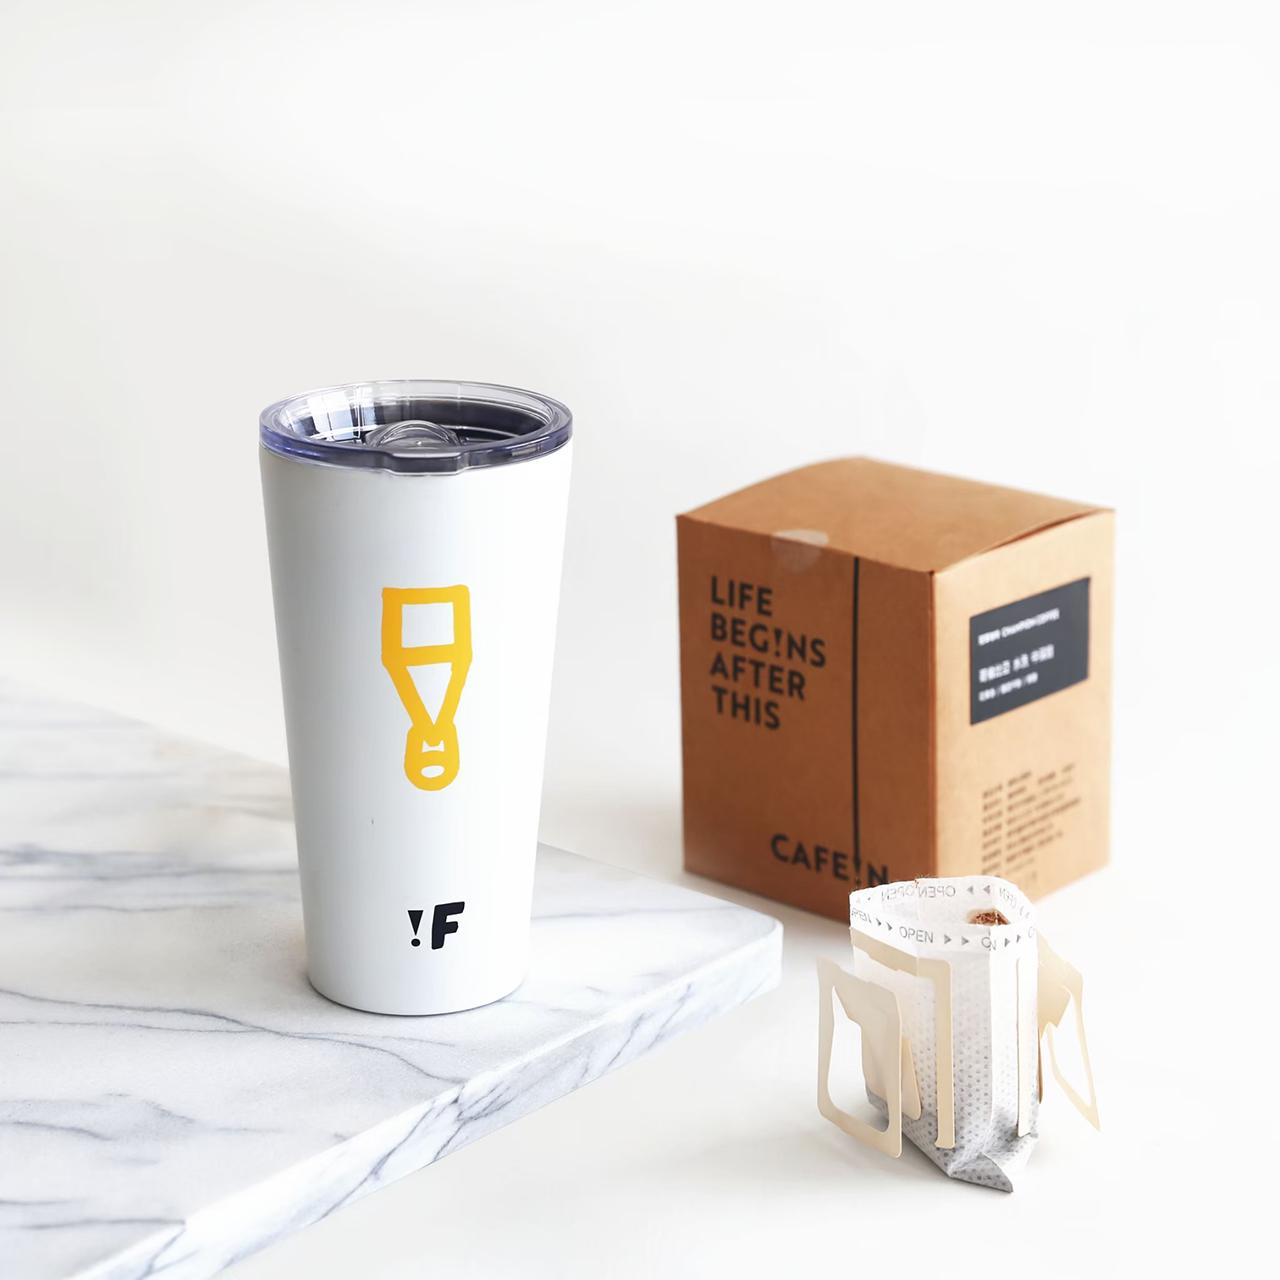 CAFE!N,生活選物,生活雜貨,咖啡,咖啡品牌